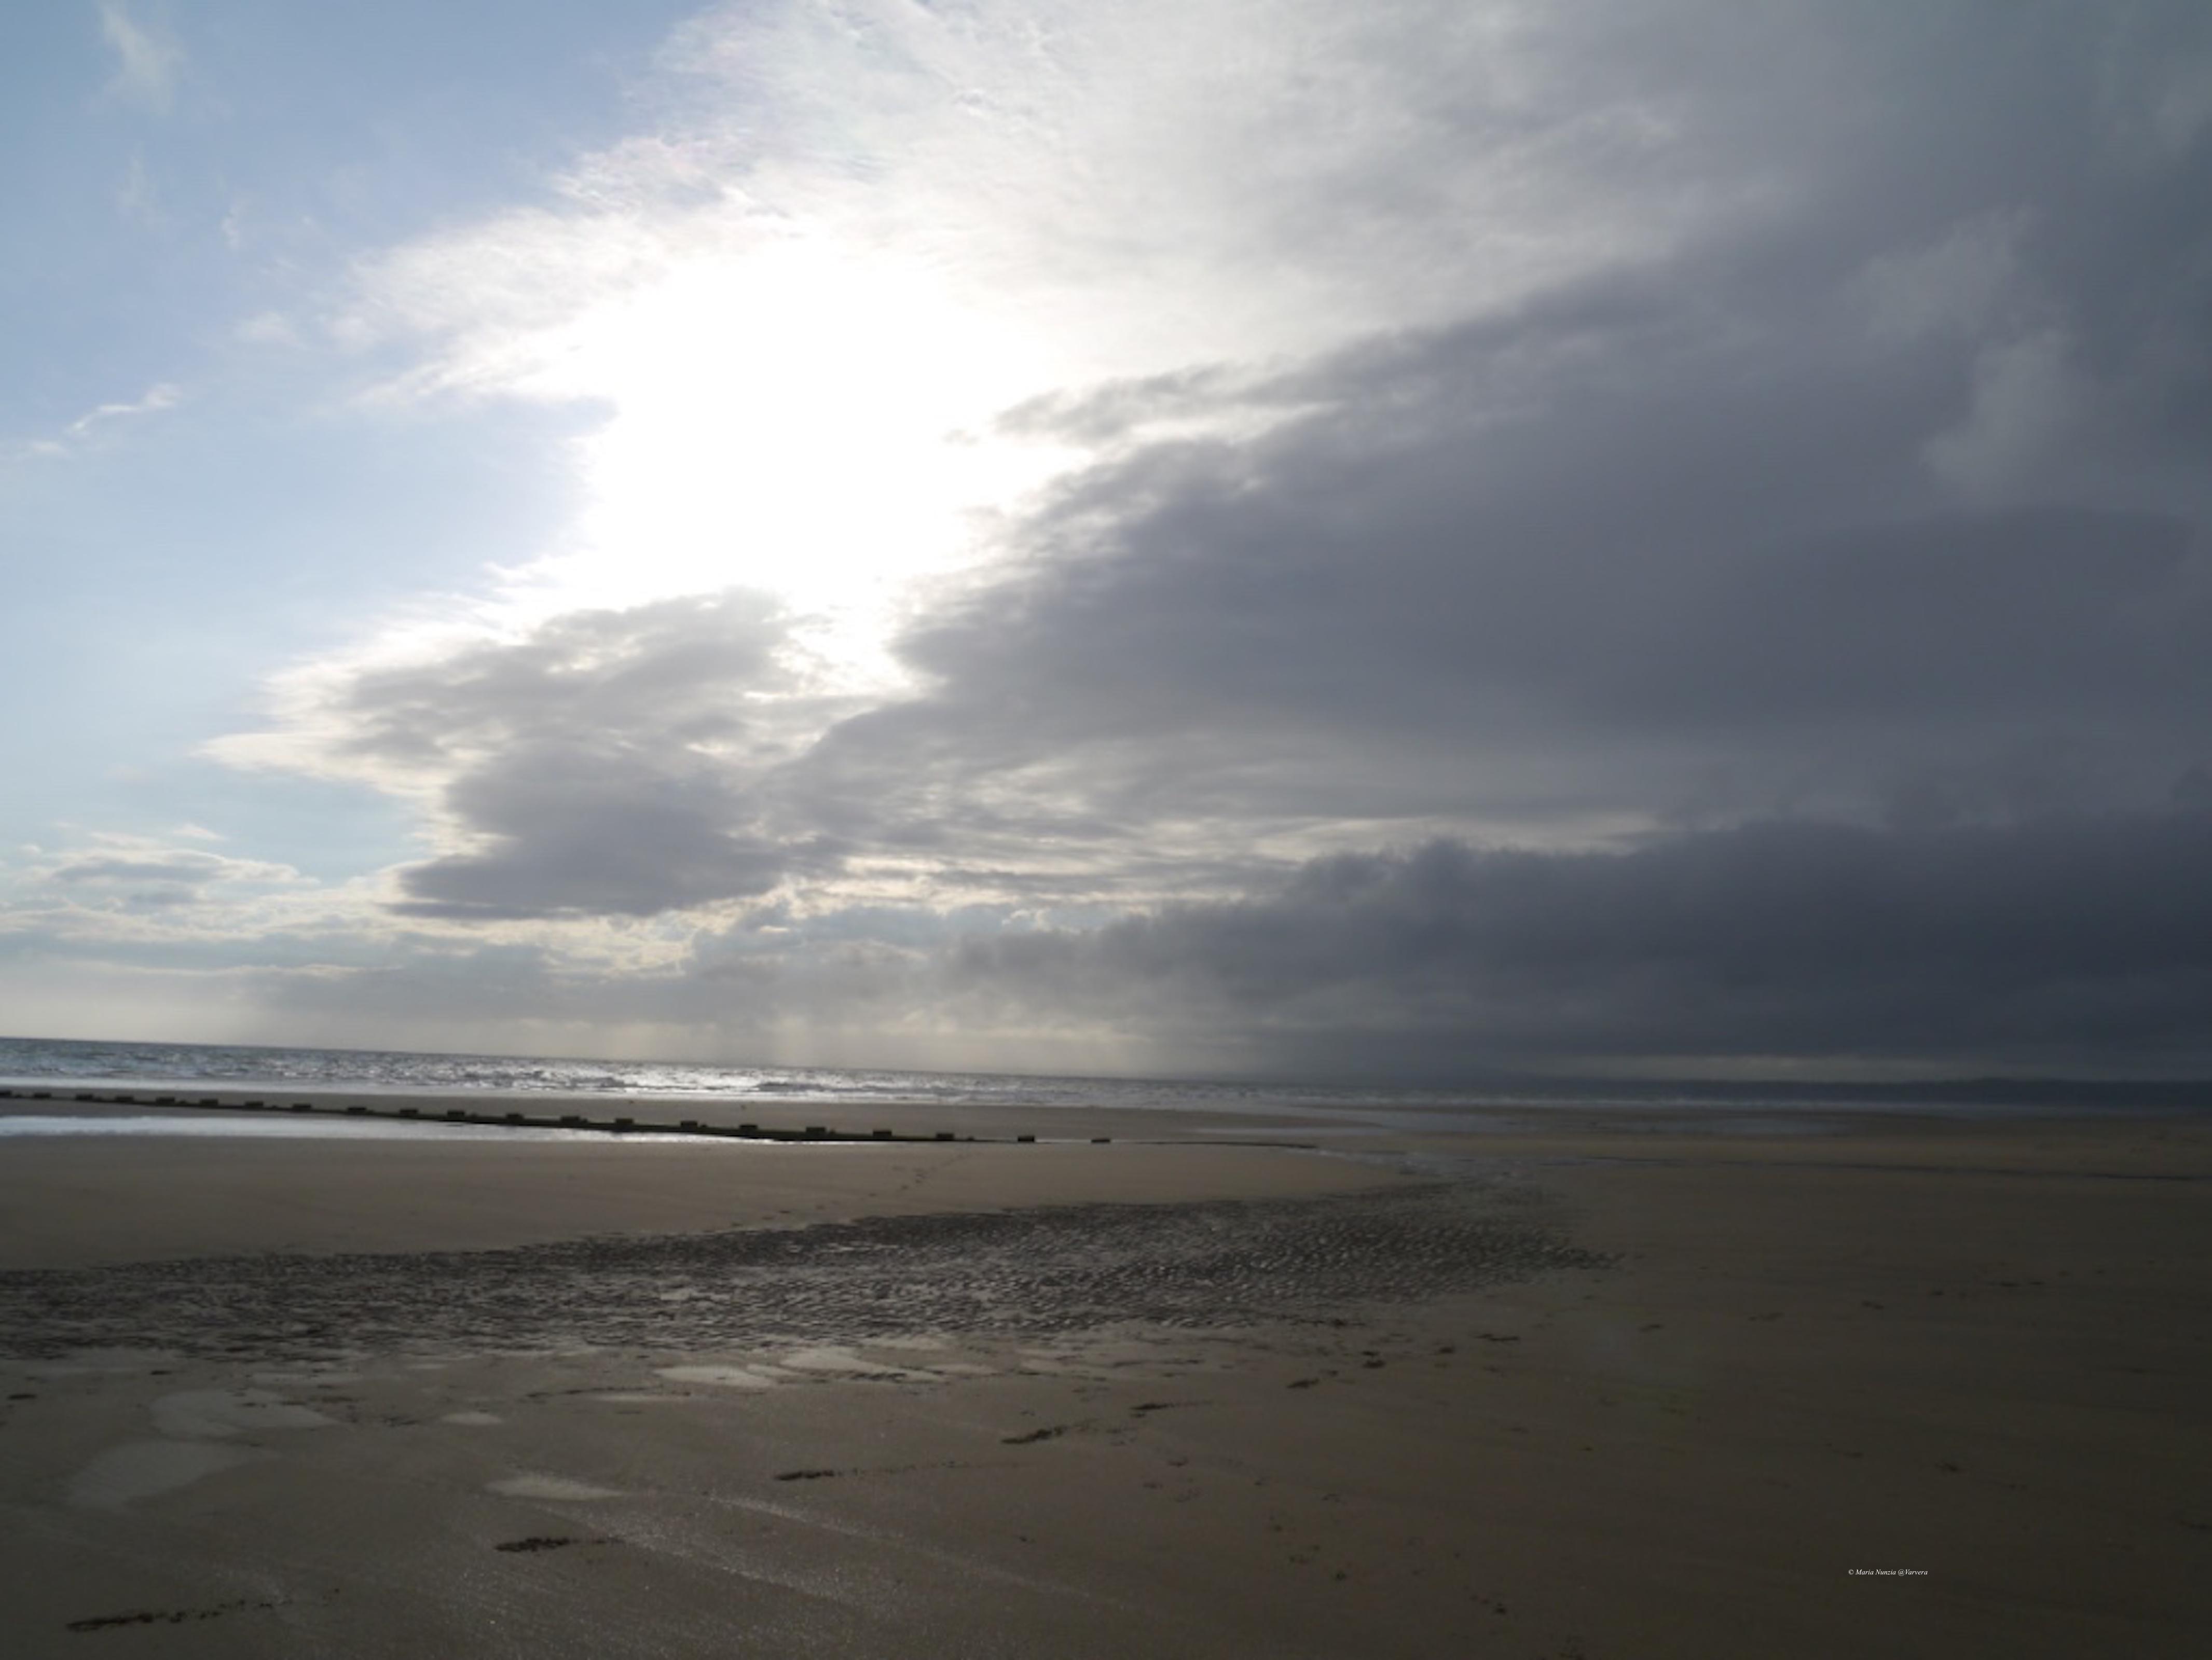 Morfa_Beach_©_Maria_Nunzia__Varvera_P1530666_1024_1024